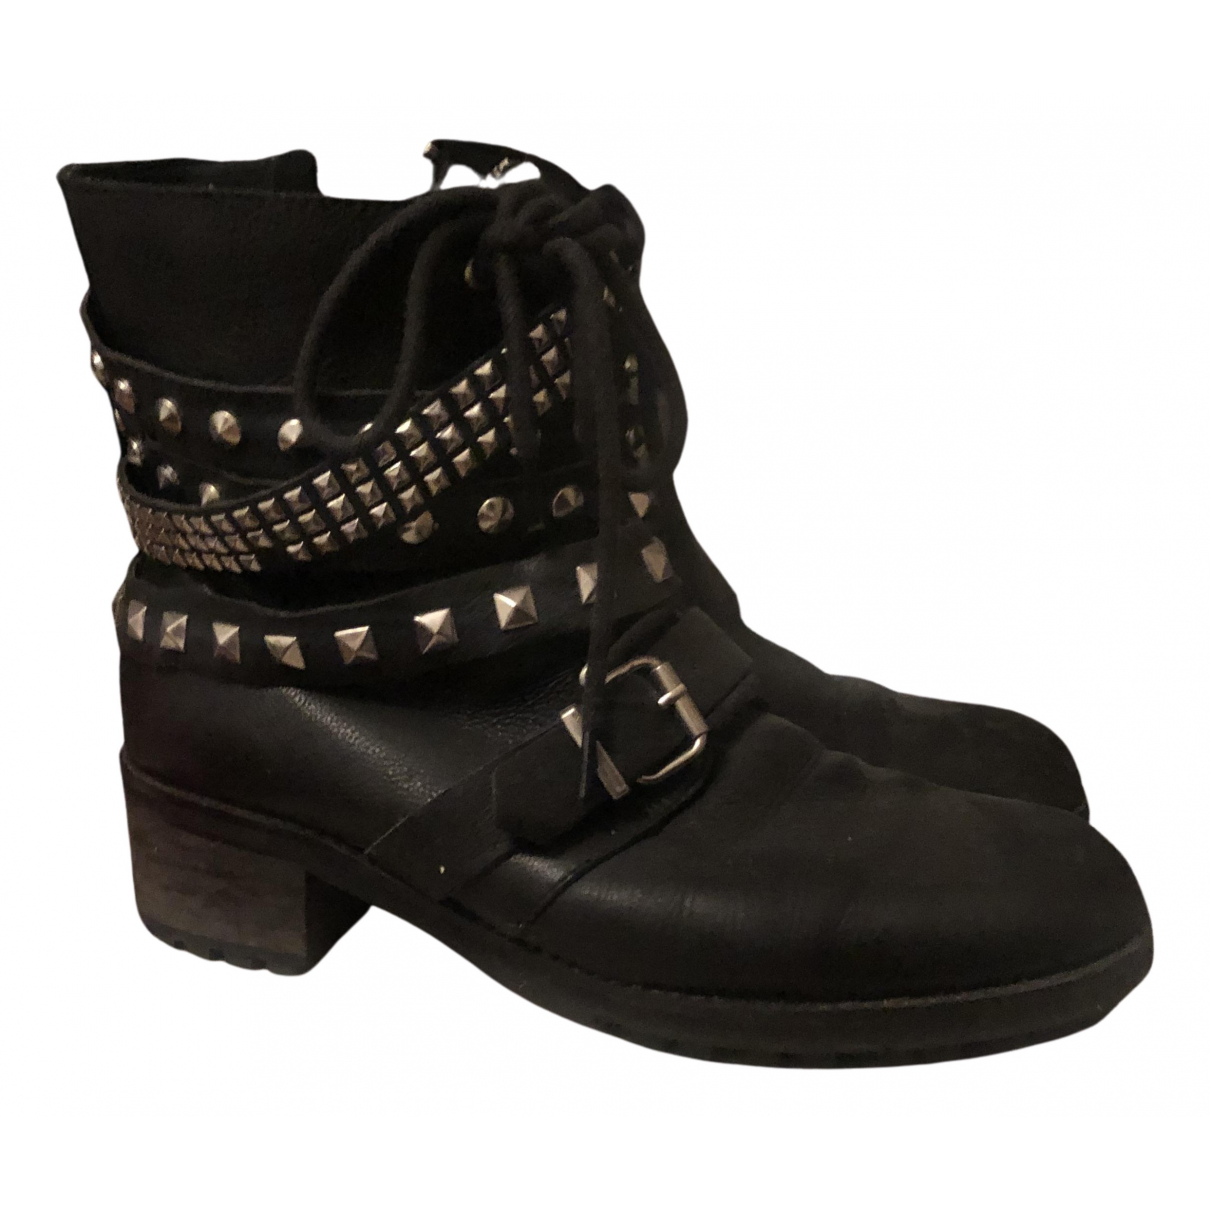 Zara N Black Leather Boots for Women 39 EU